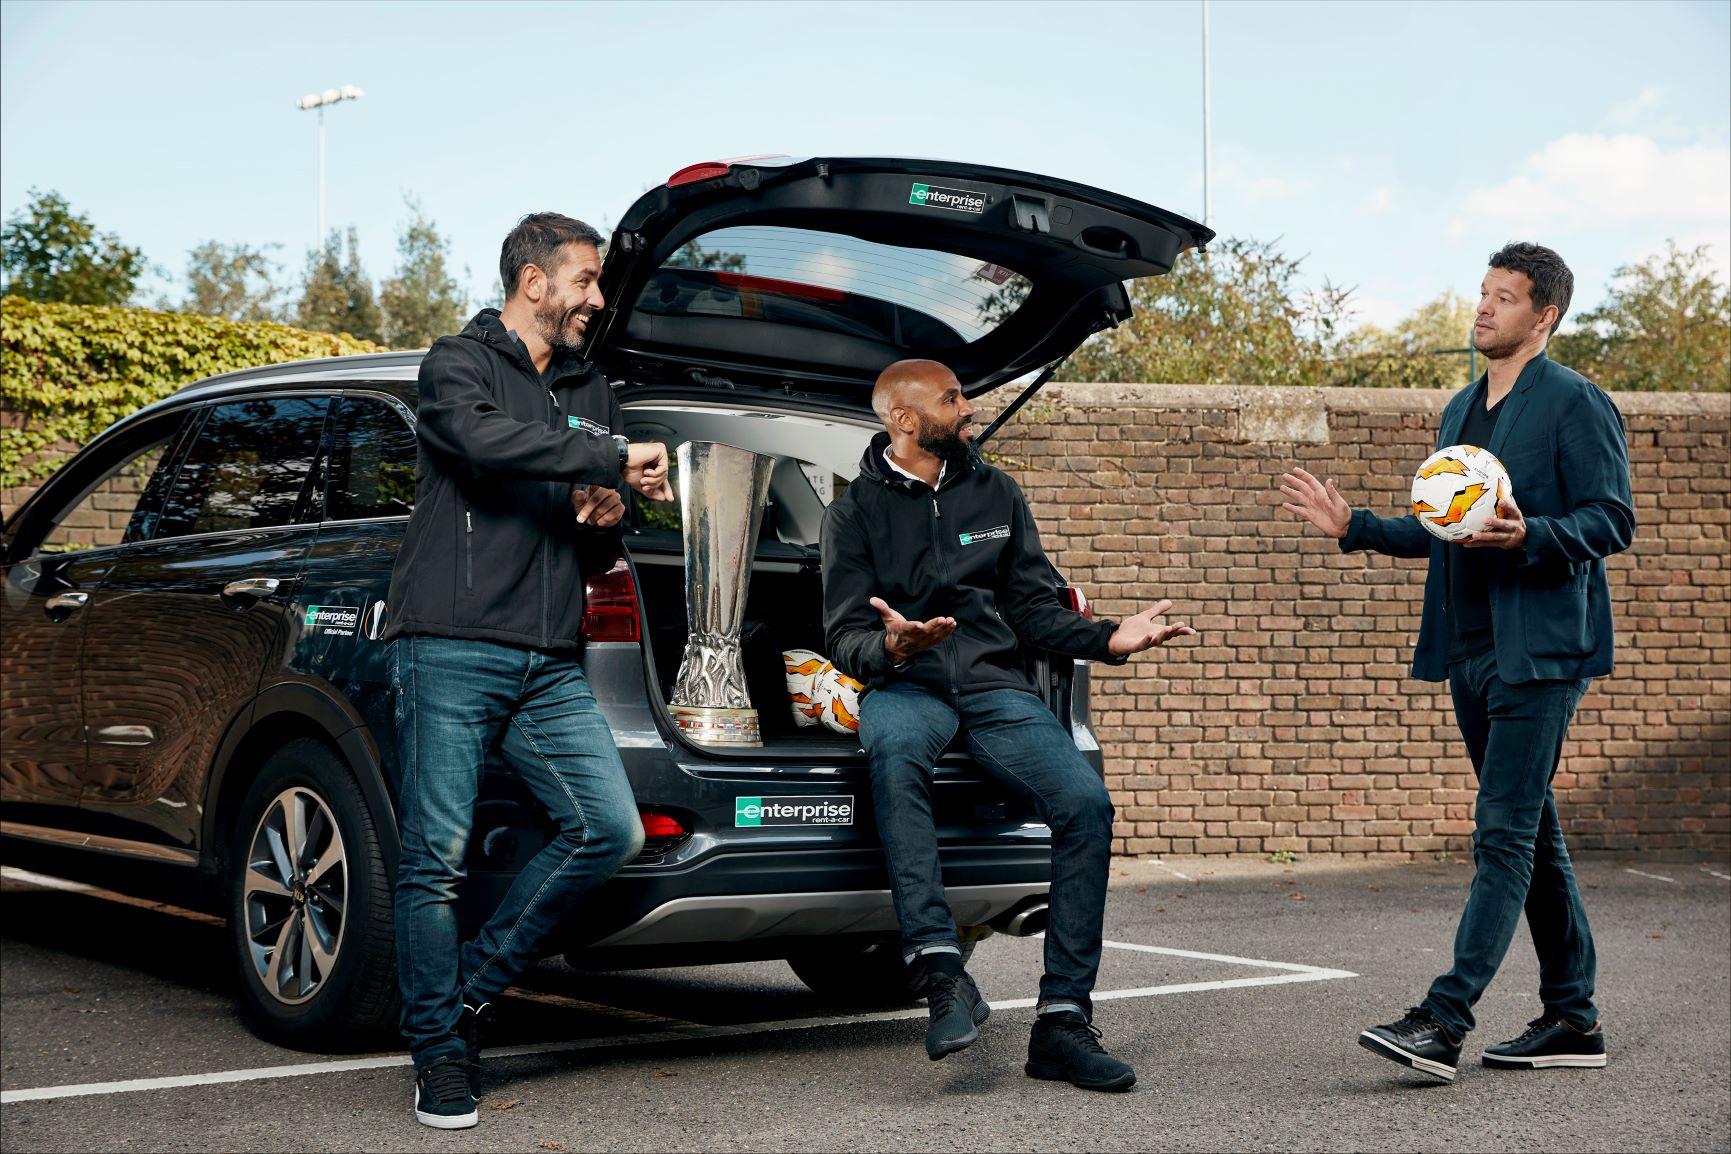 f1ef6591e7 UEFA Europa League Discount - Enterprise Rent-A-Car